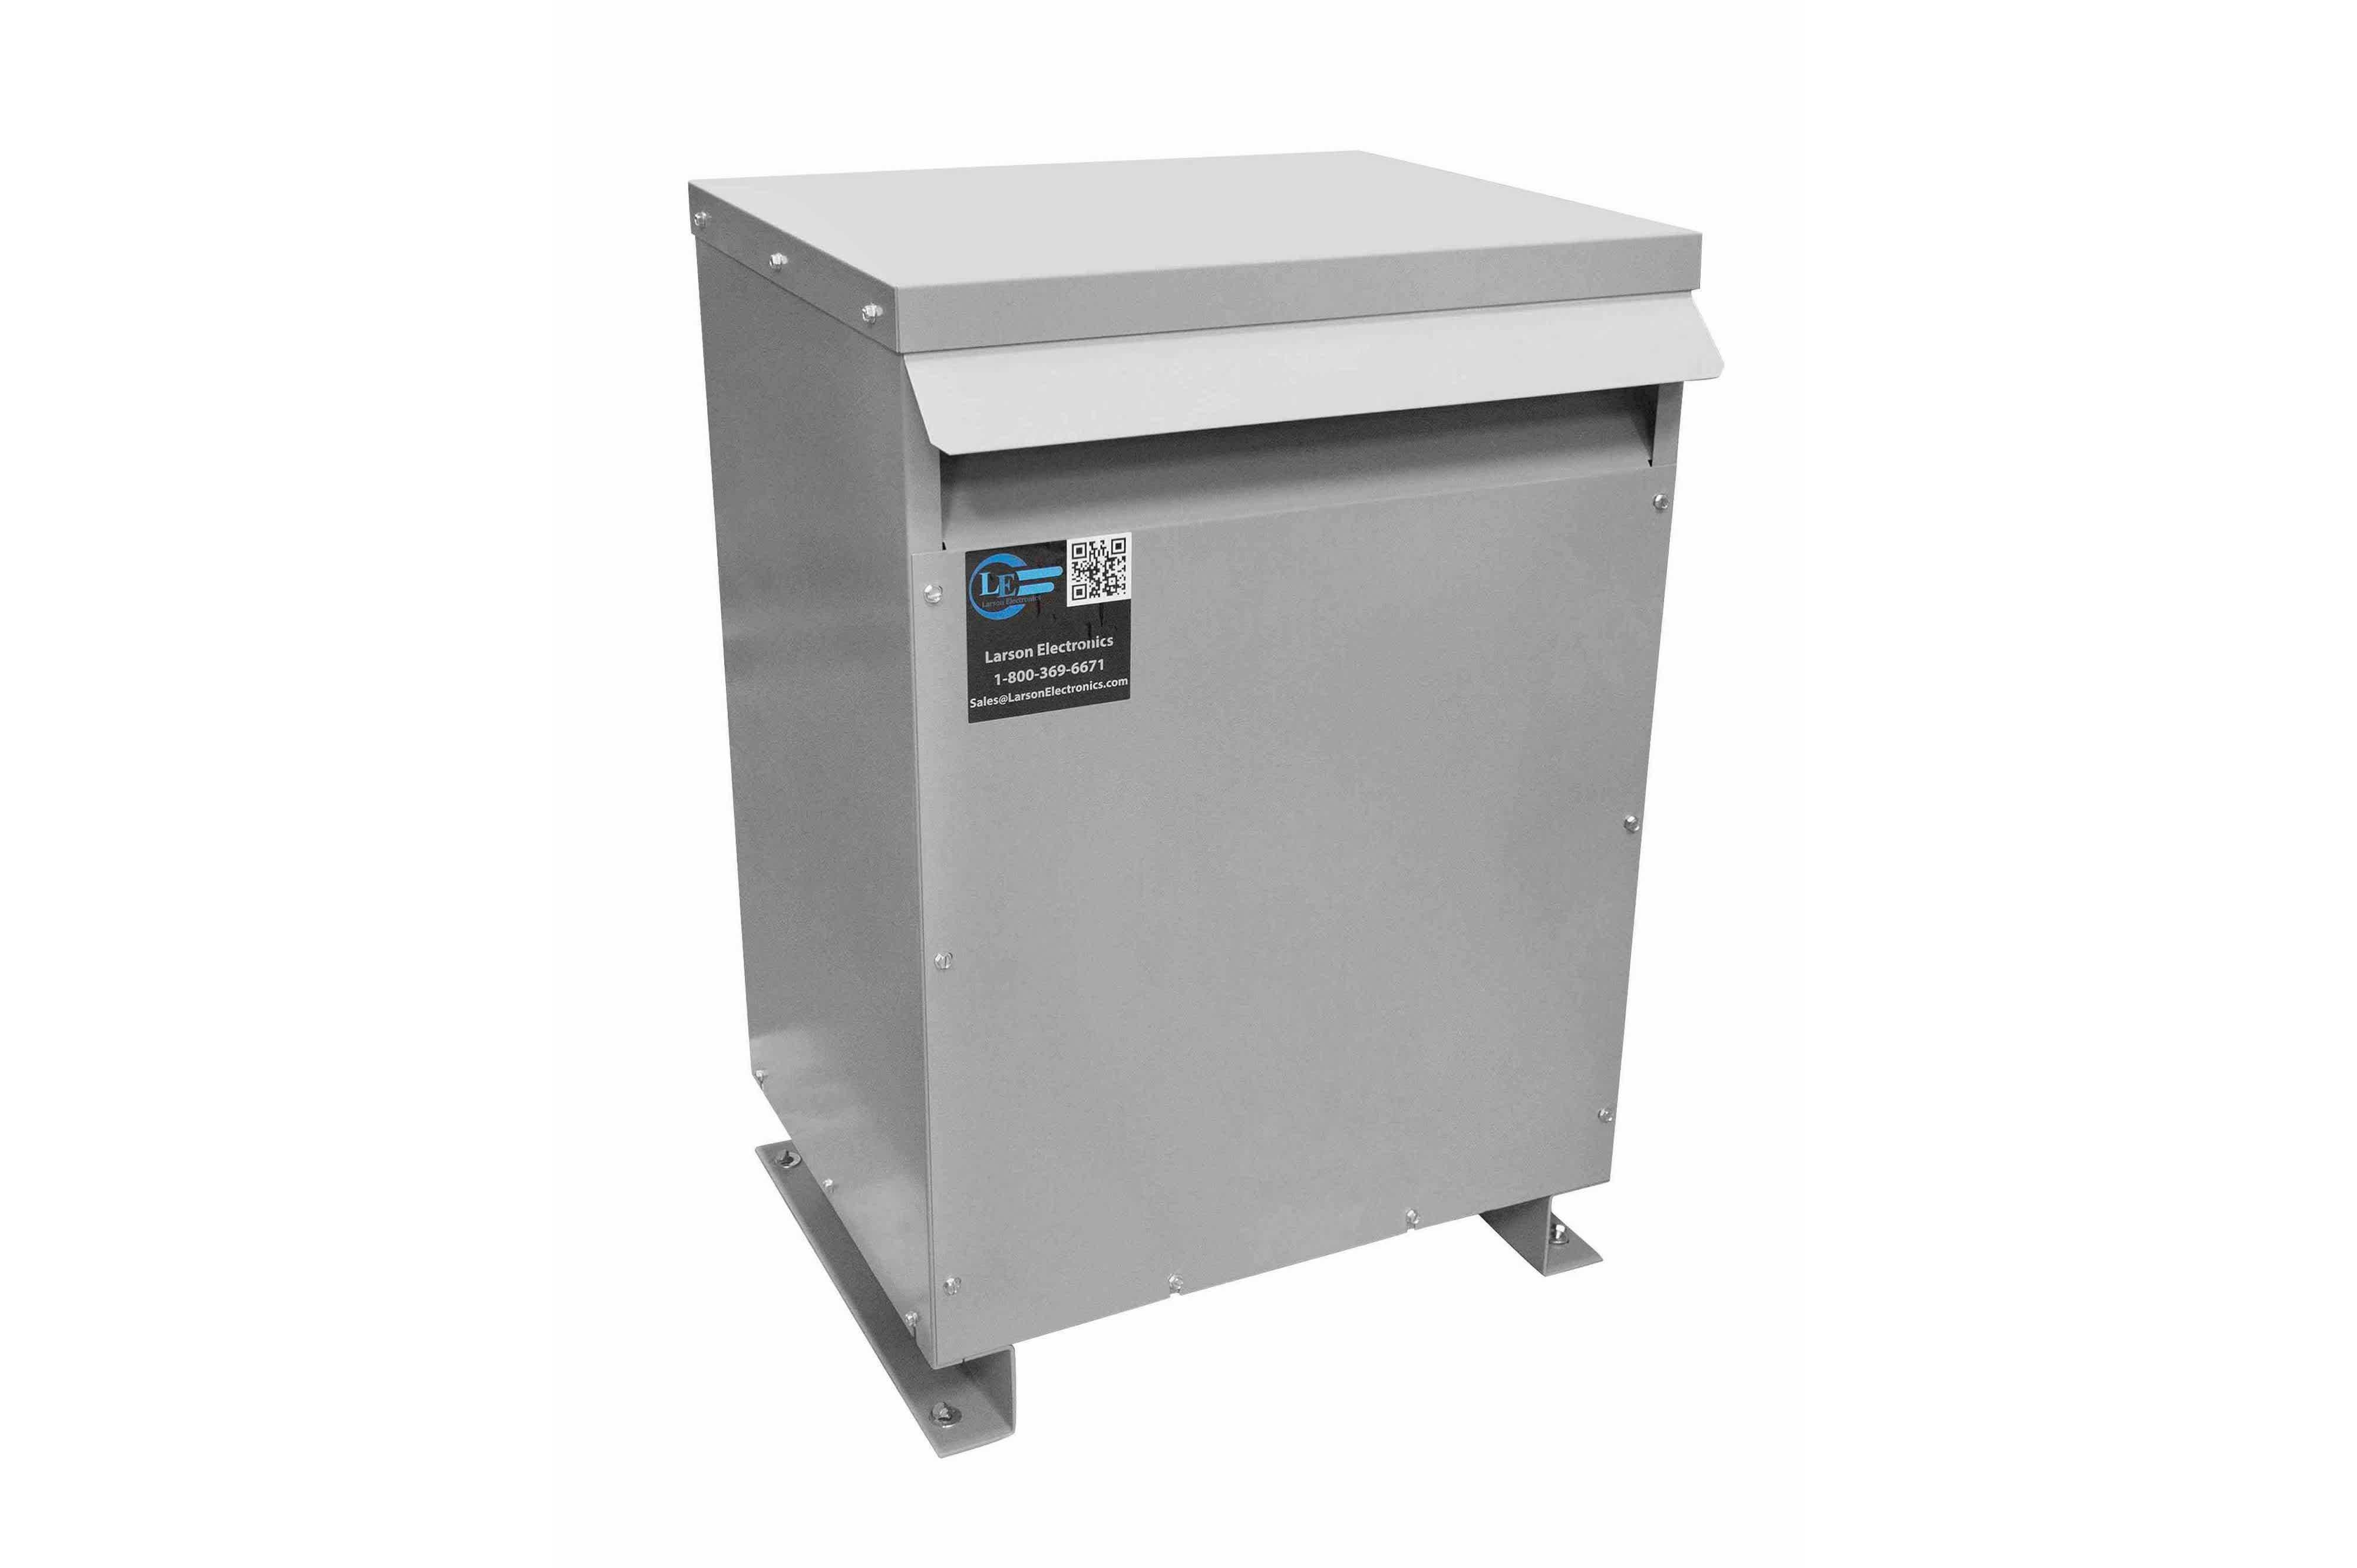 100 kVA 3PH DOE Transformer, 480V Delta Primary, 415Y/240 Wye-N Secondary, N3R, Ventilated, 60 Hz